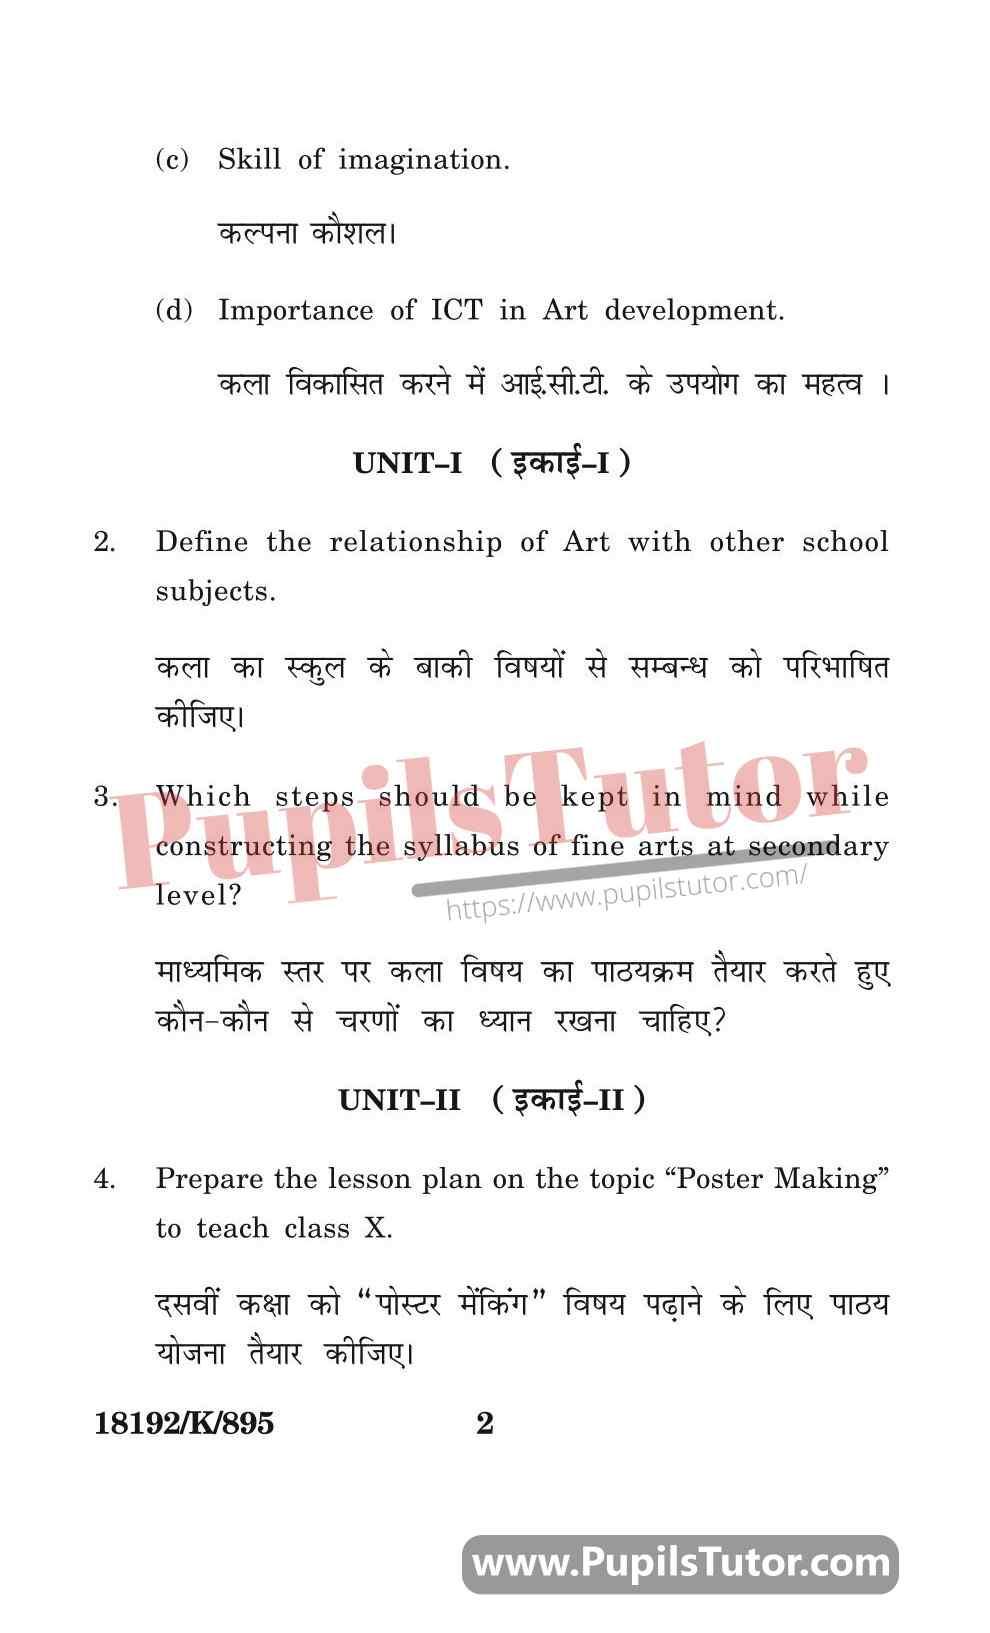 KUK (Kurukshetra University, Haryana) Pedagogy Of Art Question Paper 2020 For B.Ed 1st And 2nd Year And All The 4 Semesters In English And Hindi Medium Free Download PDF - Page 2 - www.pupilstutor.com